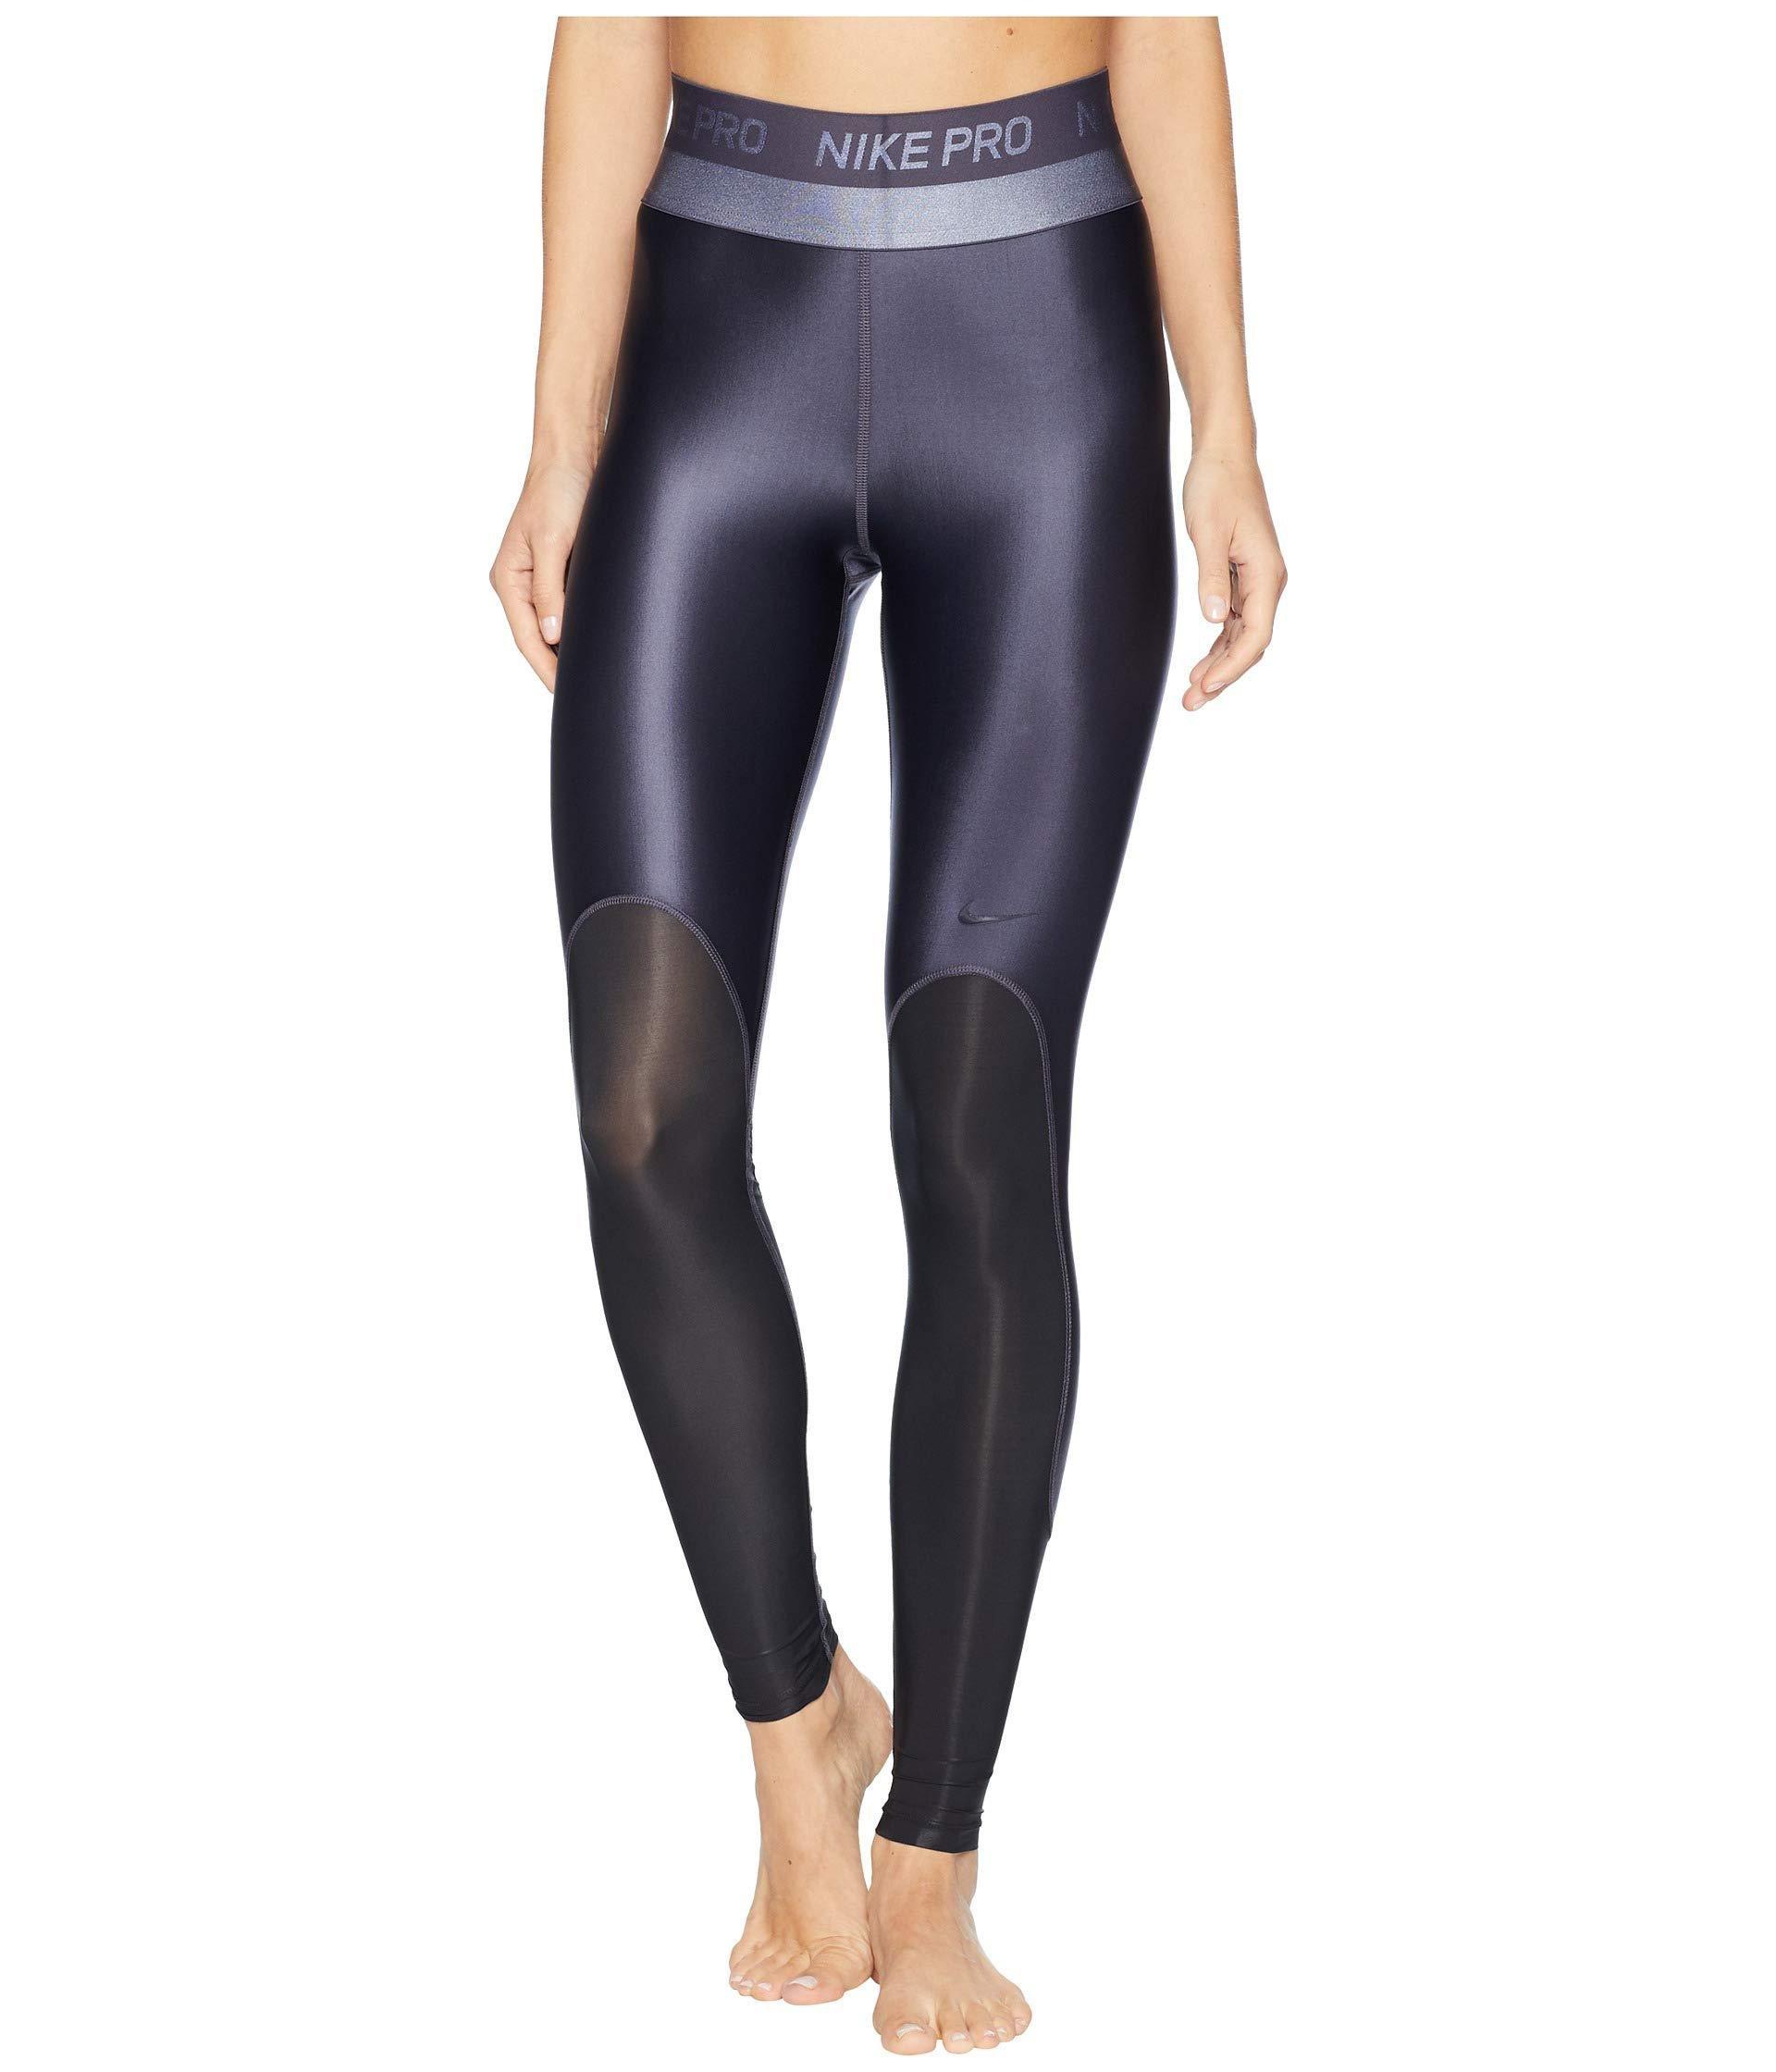 710d8e6dd3 Nike Pro Hypercool Glamour Tights in Black - Lyst